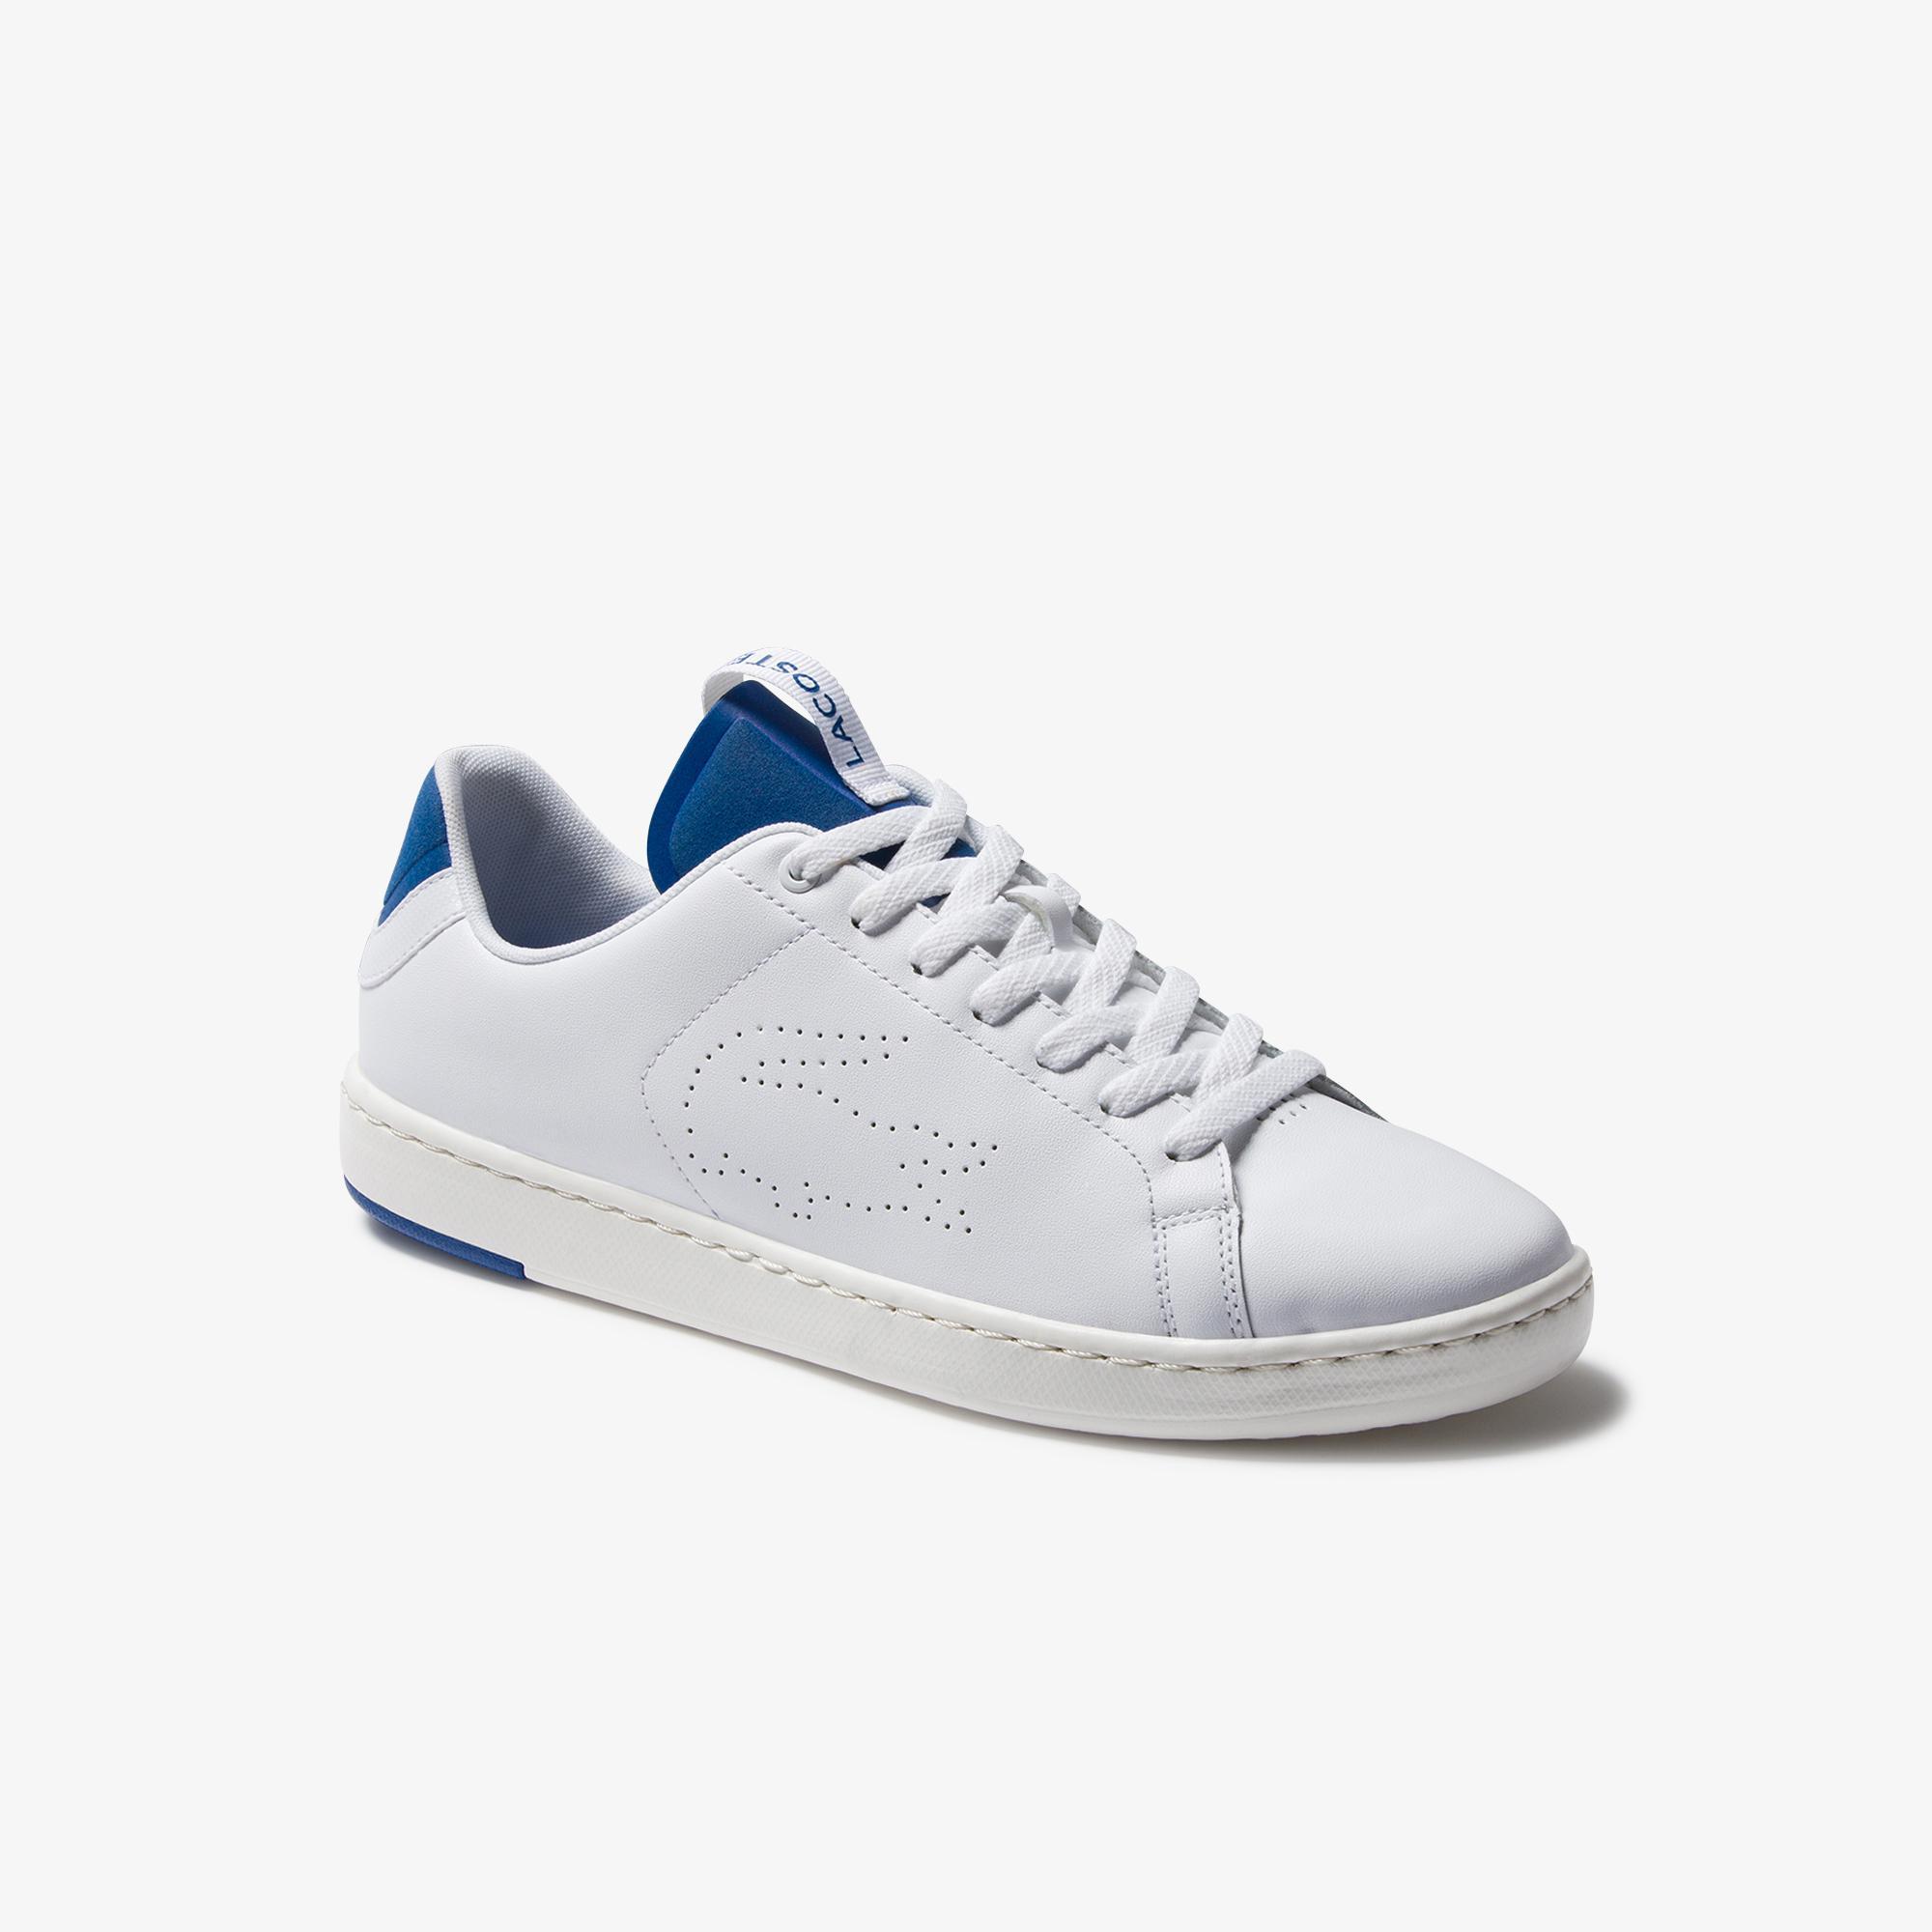 Lacoste Carnaby Evo Light-Wt 1201Sma Erkek Beyaz - Mavi Deri Sneaker